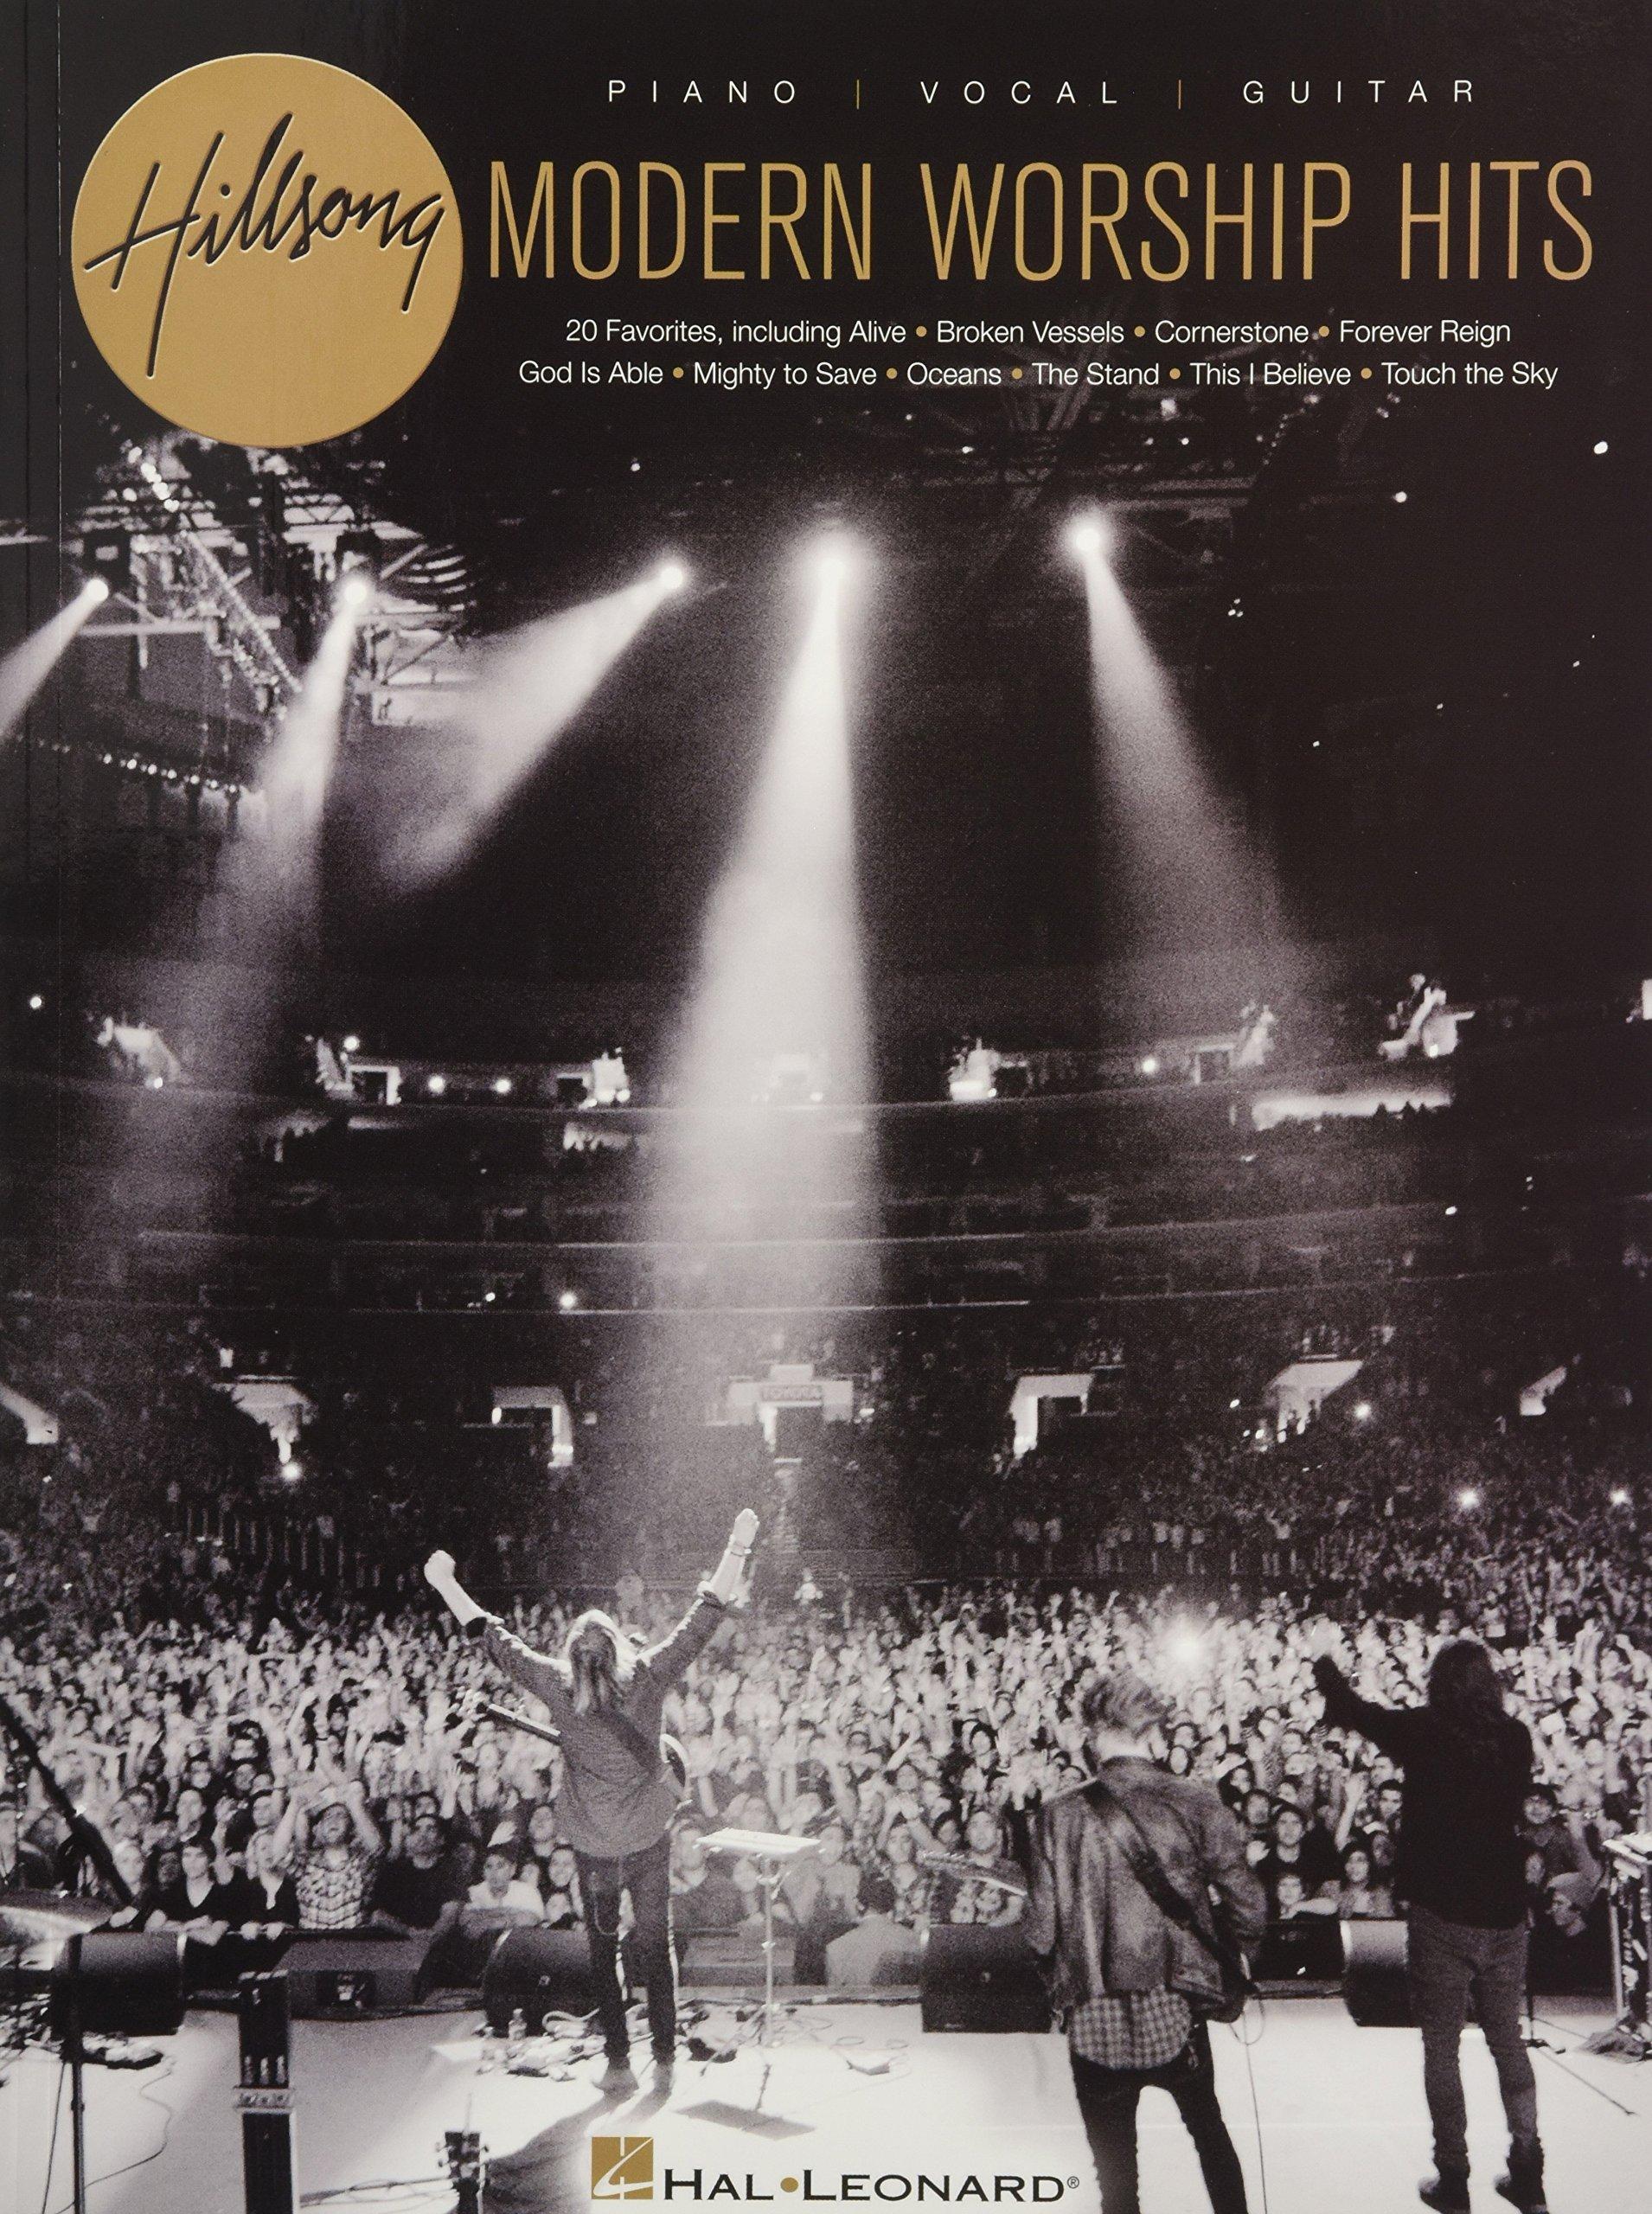 Hillsong Modern Worship Hits ebook